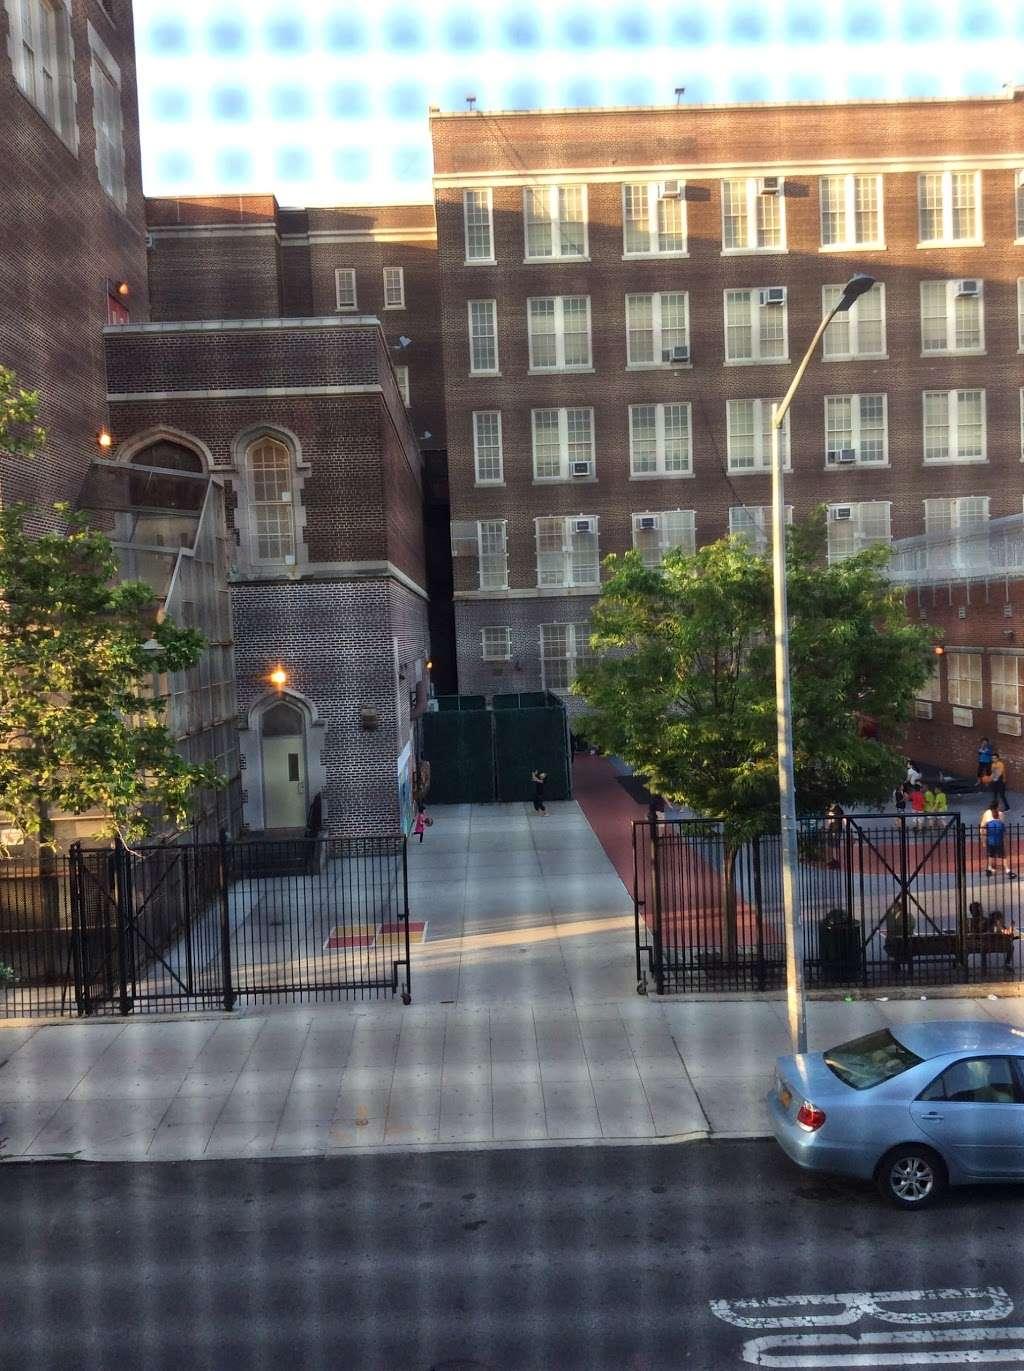 Sunset Park School - school  | Photo 9 of 10 | Address: 4305 7th Ave, Brooklyn, NY 11232, USA | Phone: (718) 853-3224